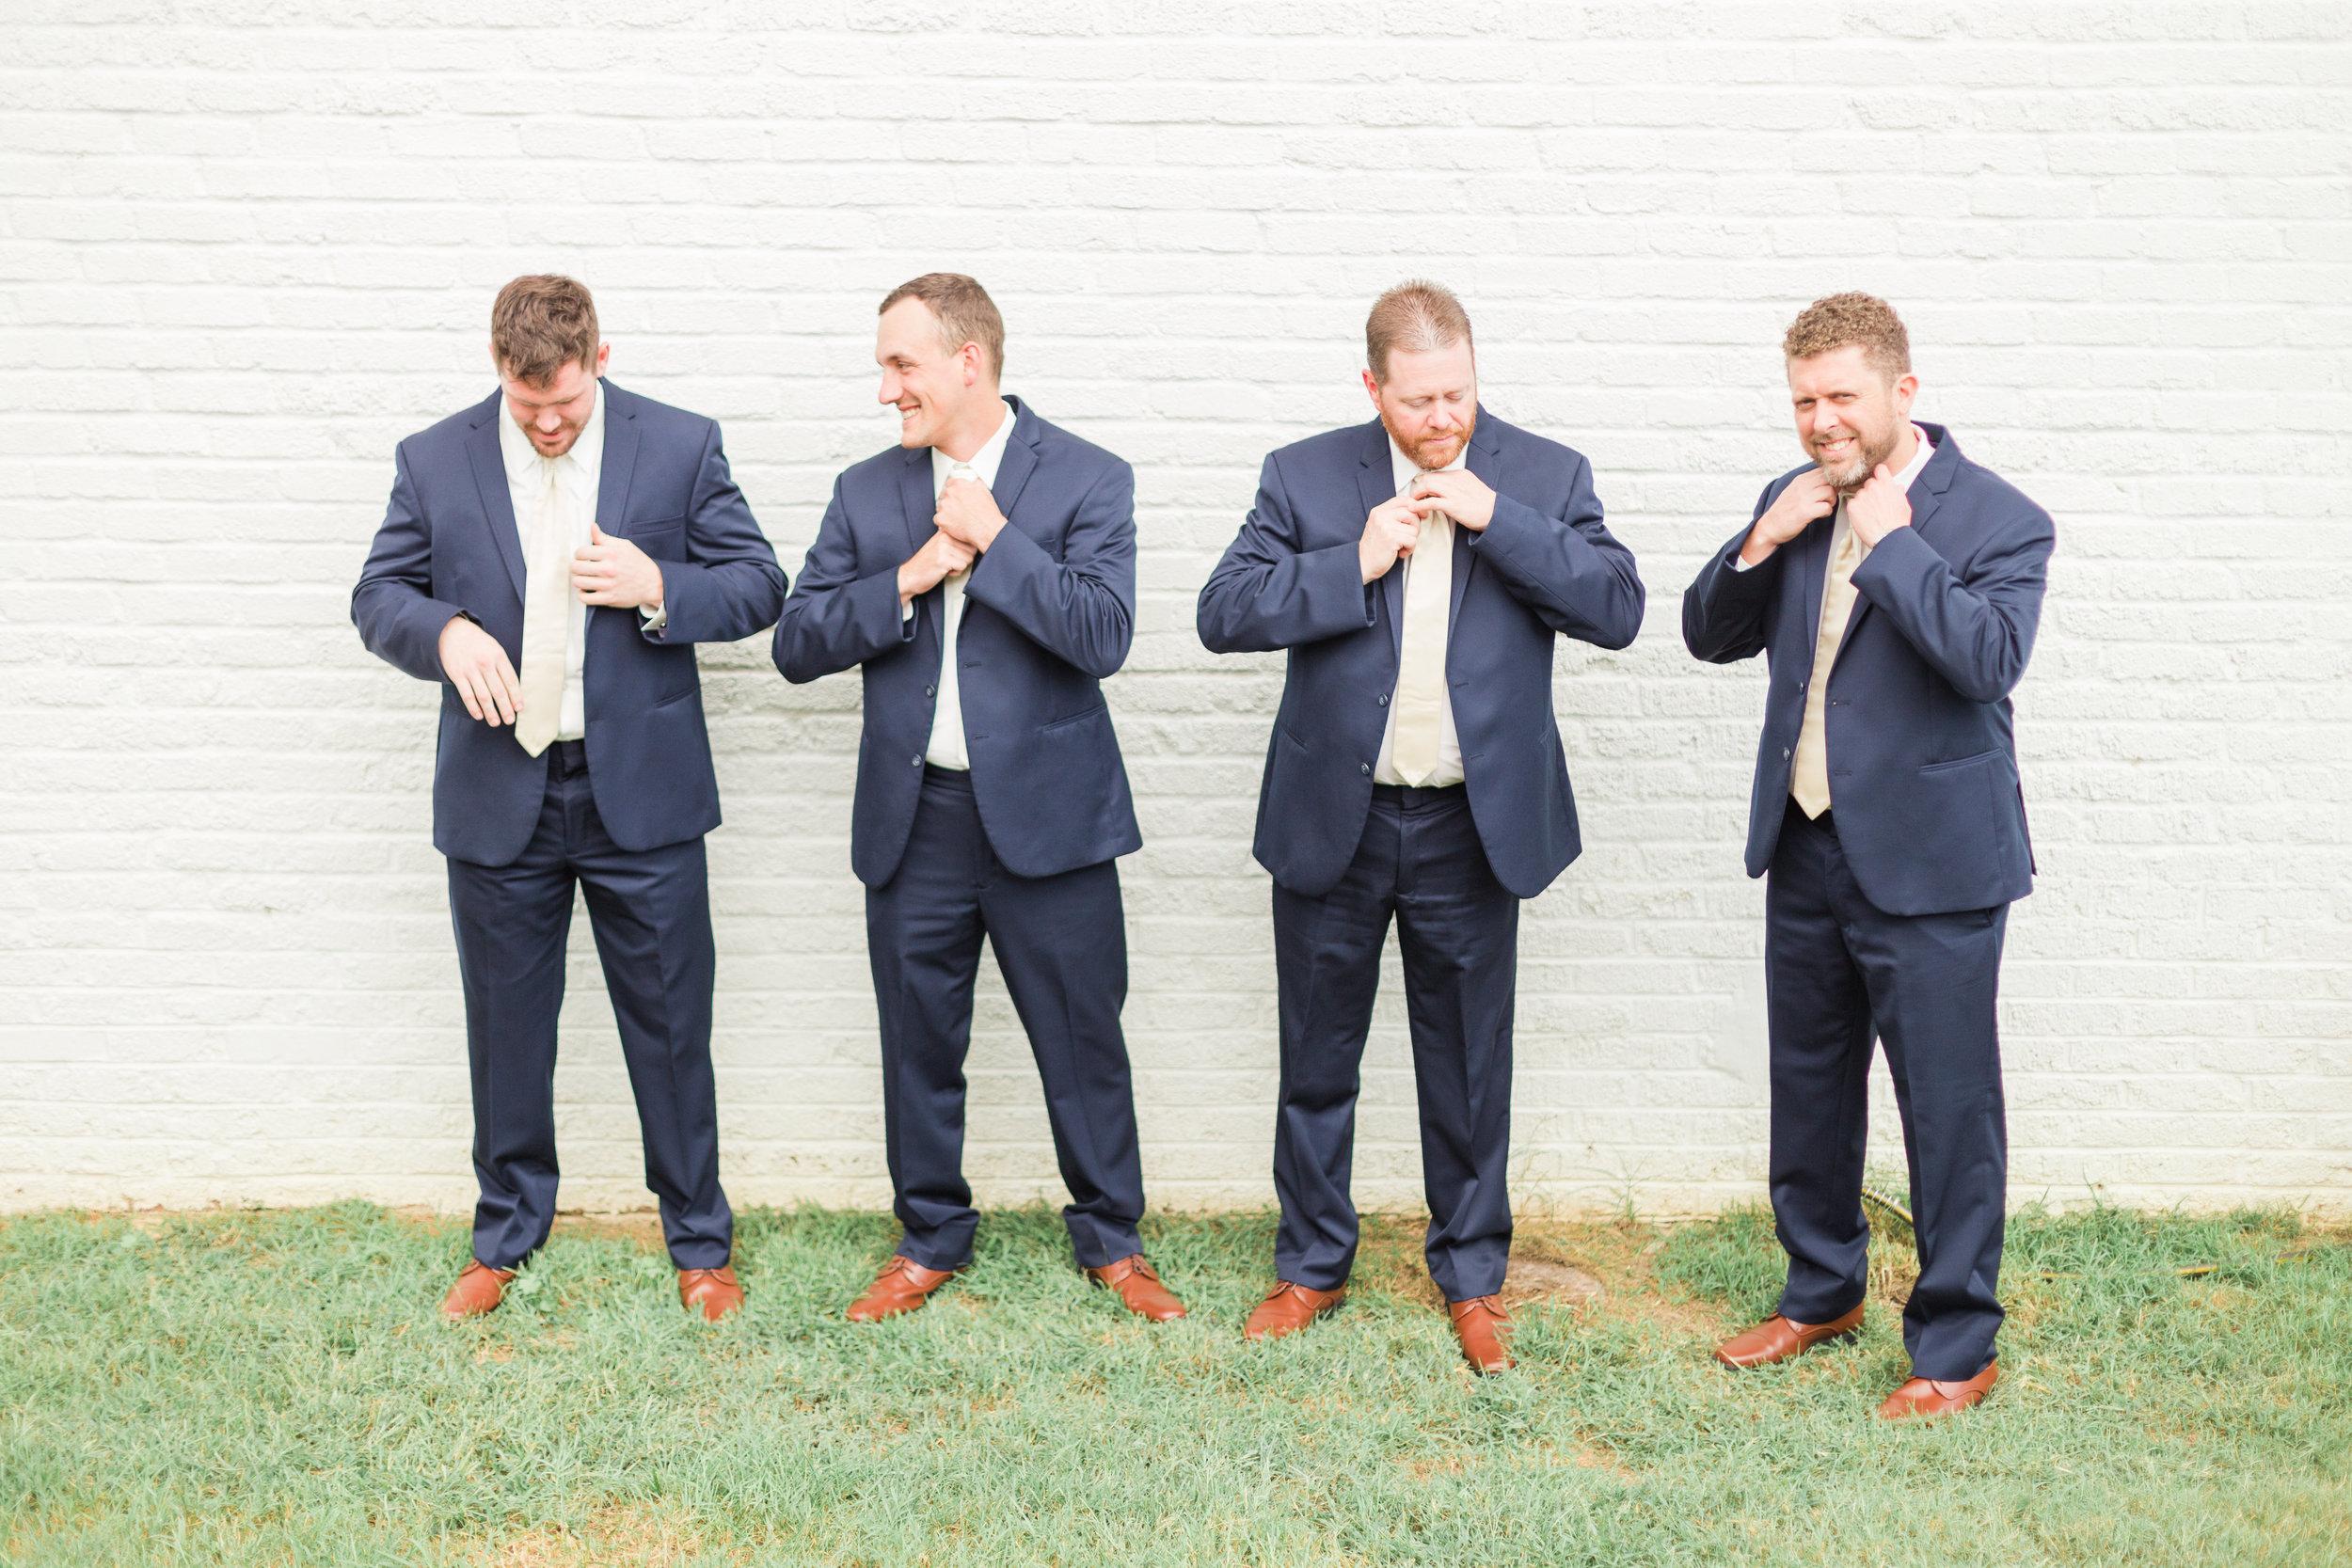 Plantation-On-Sunnybrook-Wedding-Photos_Roanoke-Wedding-Photographer_Jessica-Gre-0058.jpg